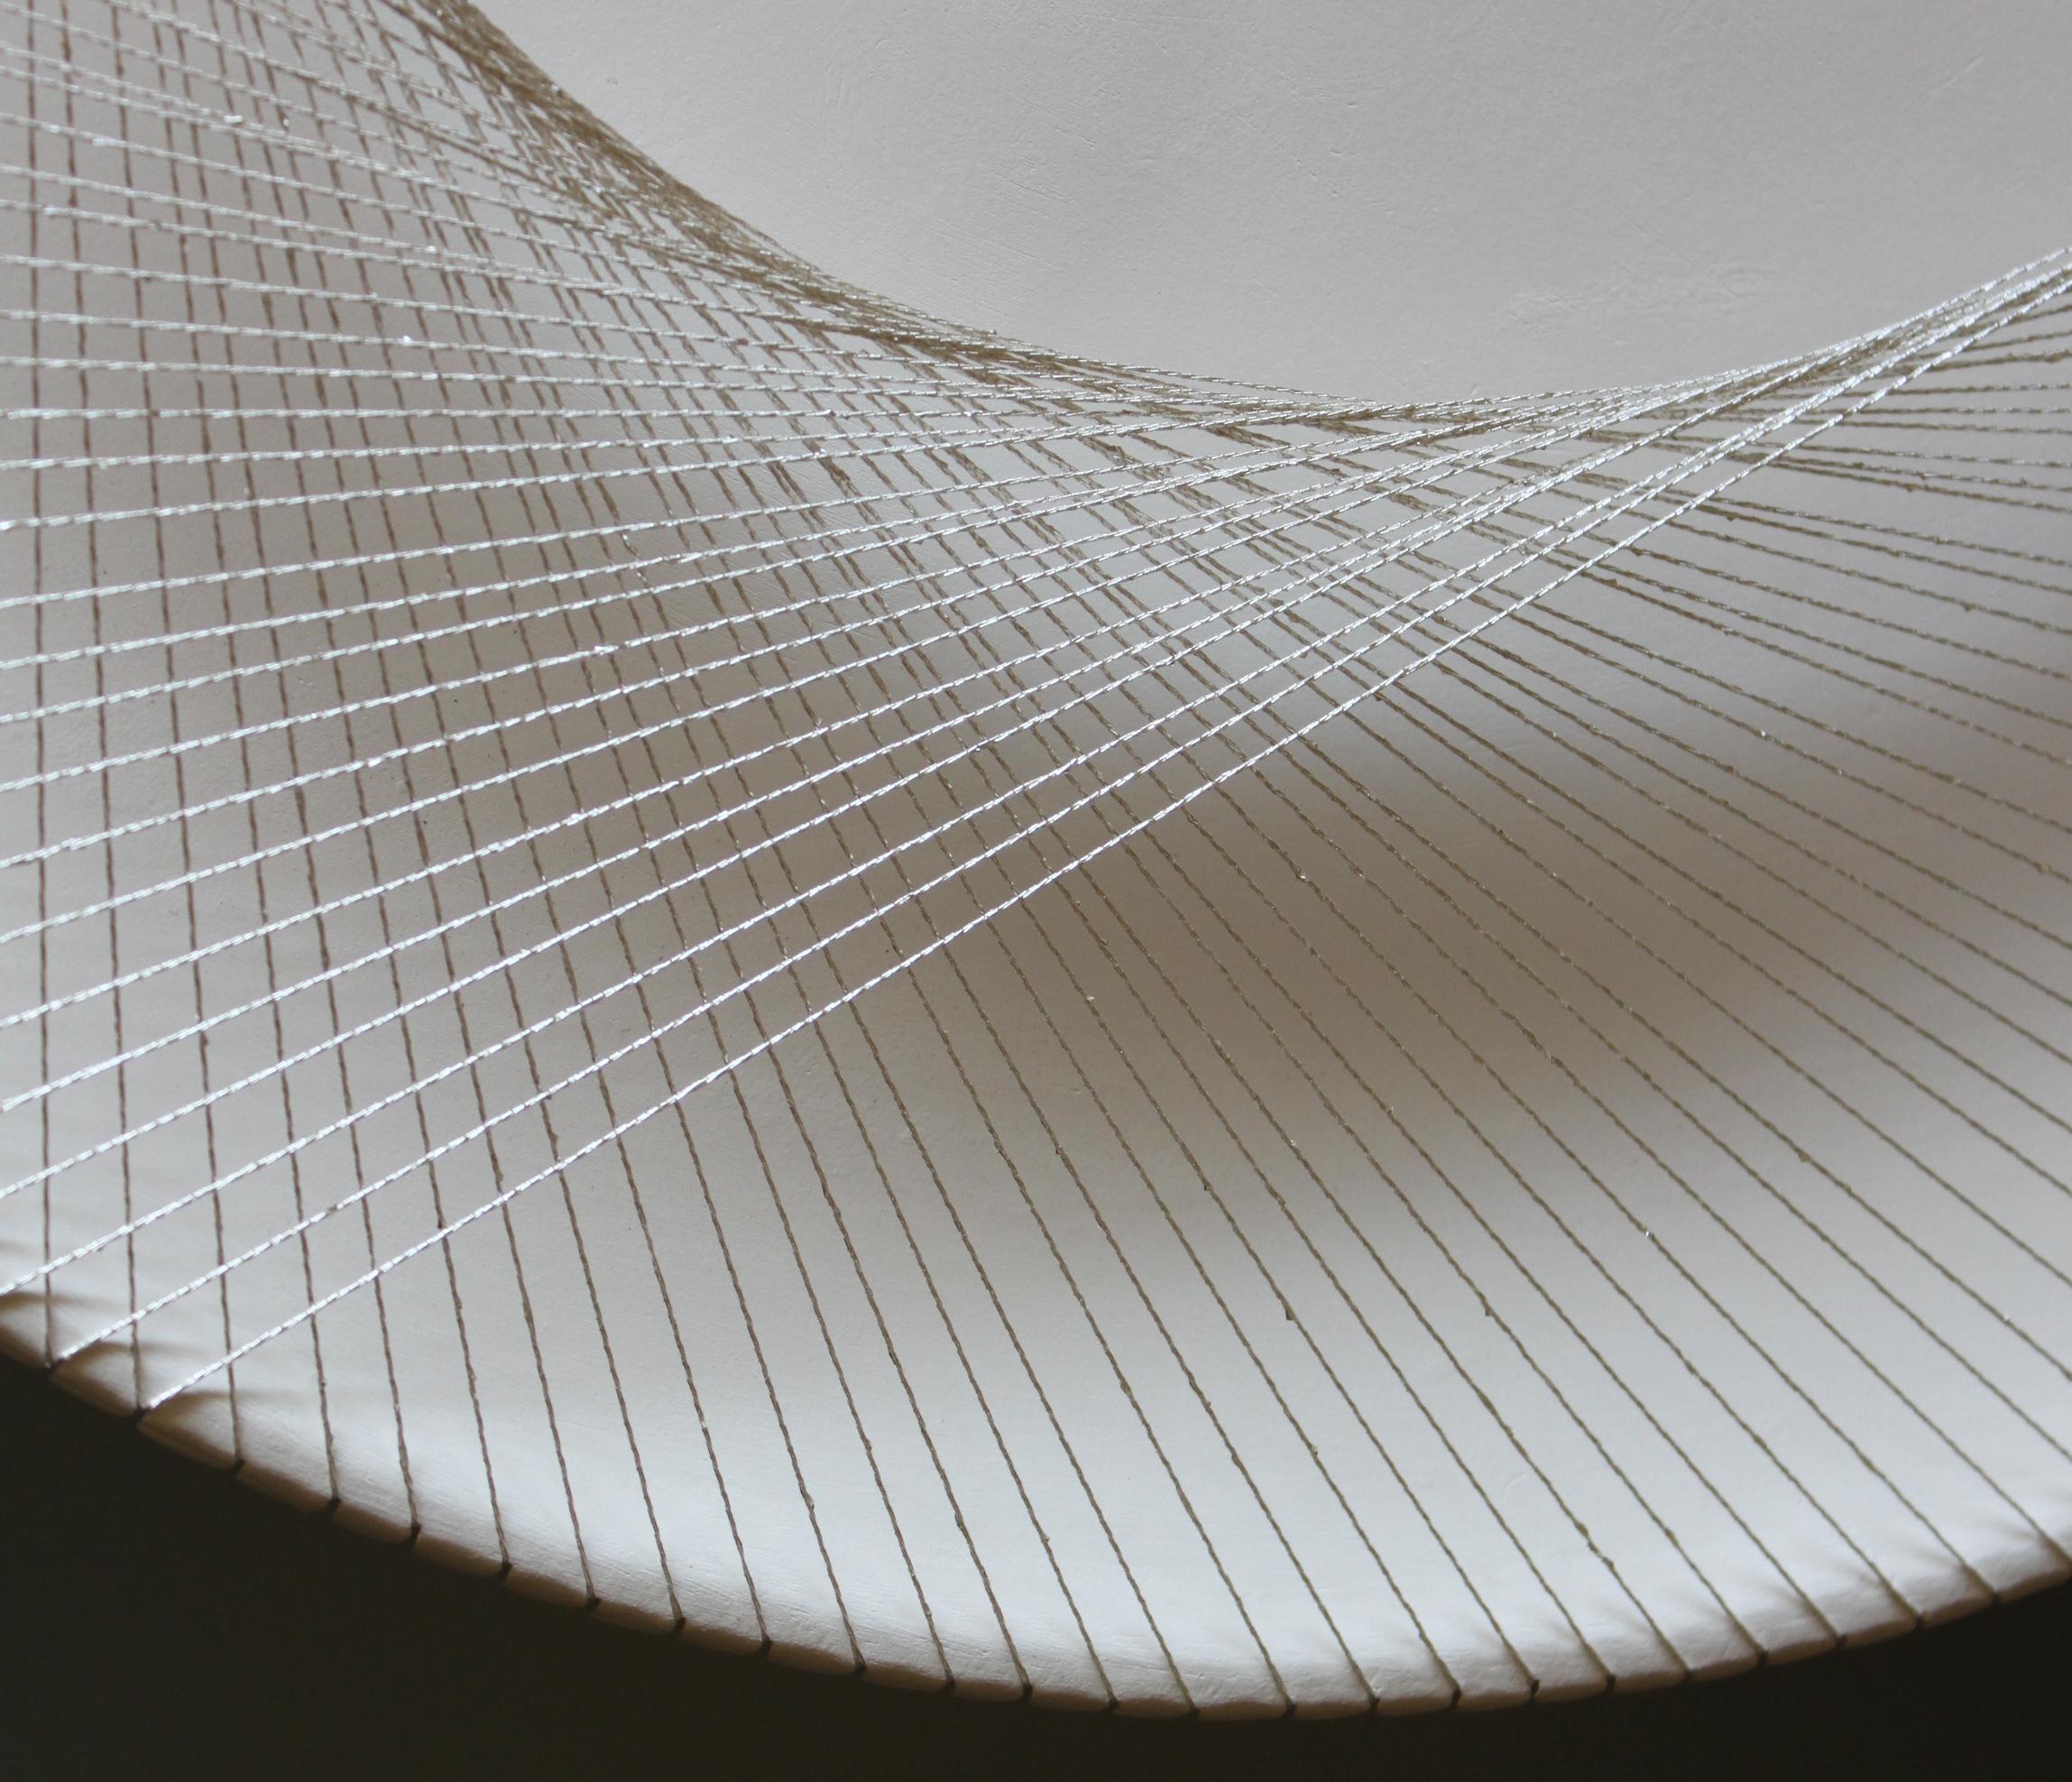 Ravel _ Doda Design _ Rae'ut Stern and Aya Margulis 2.jpg